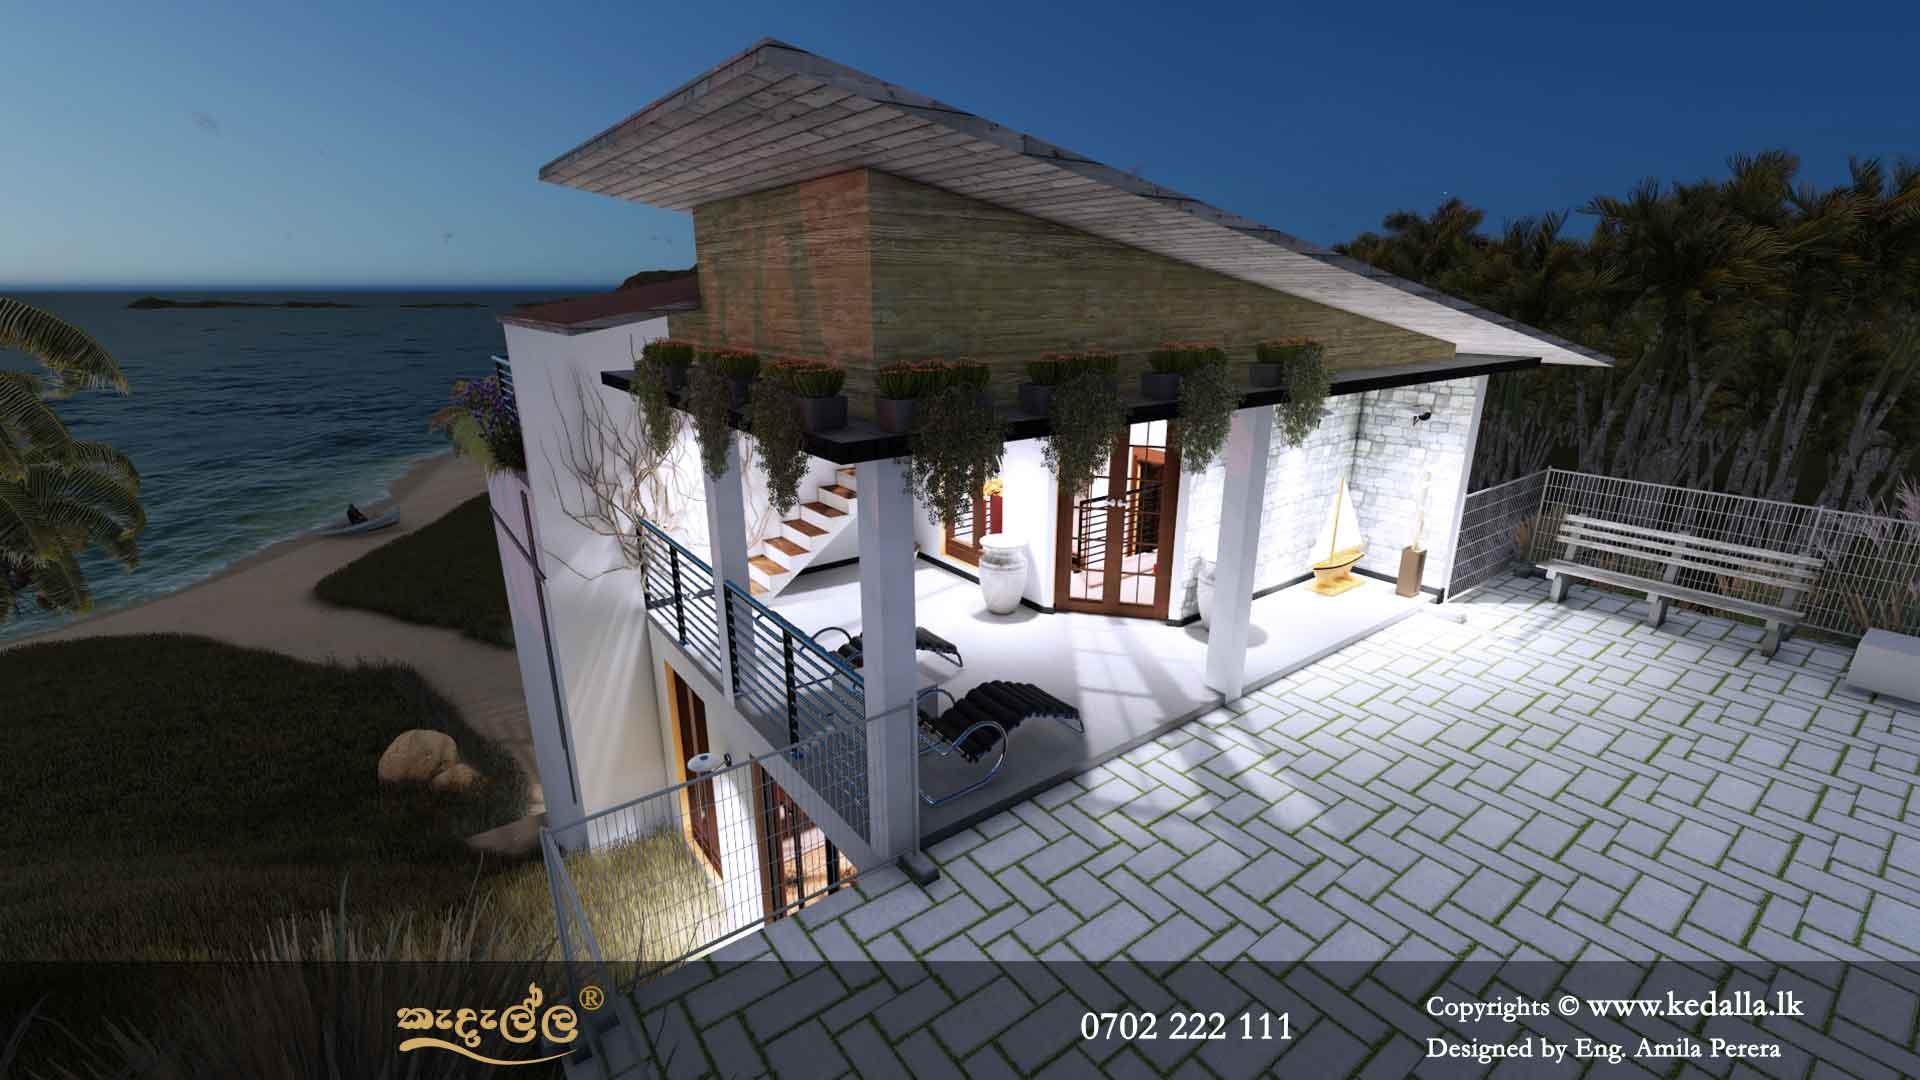 3 Bedroom House Plans in Sri Lanka Home Designs Kedalla.lk